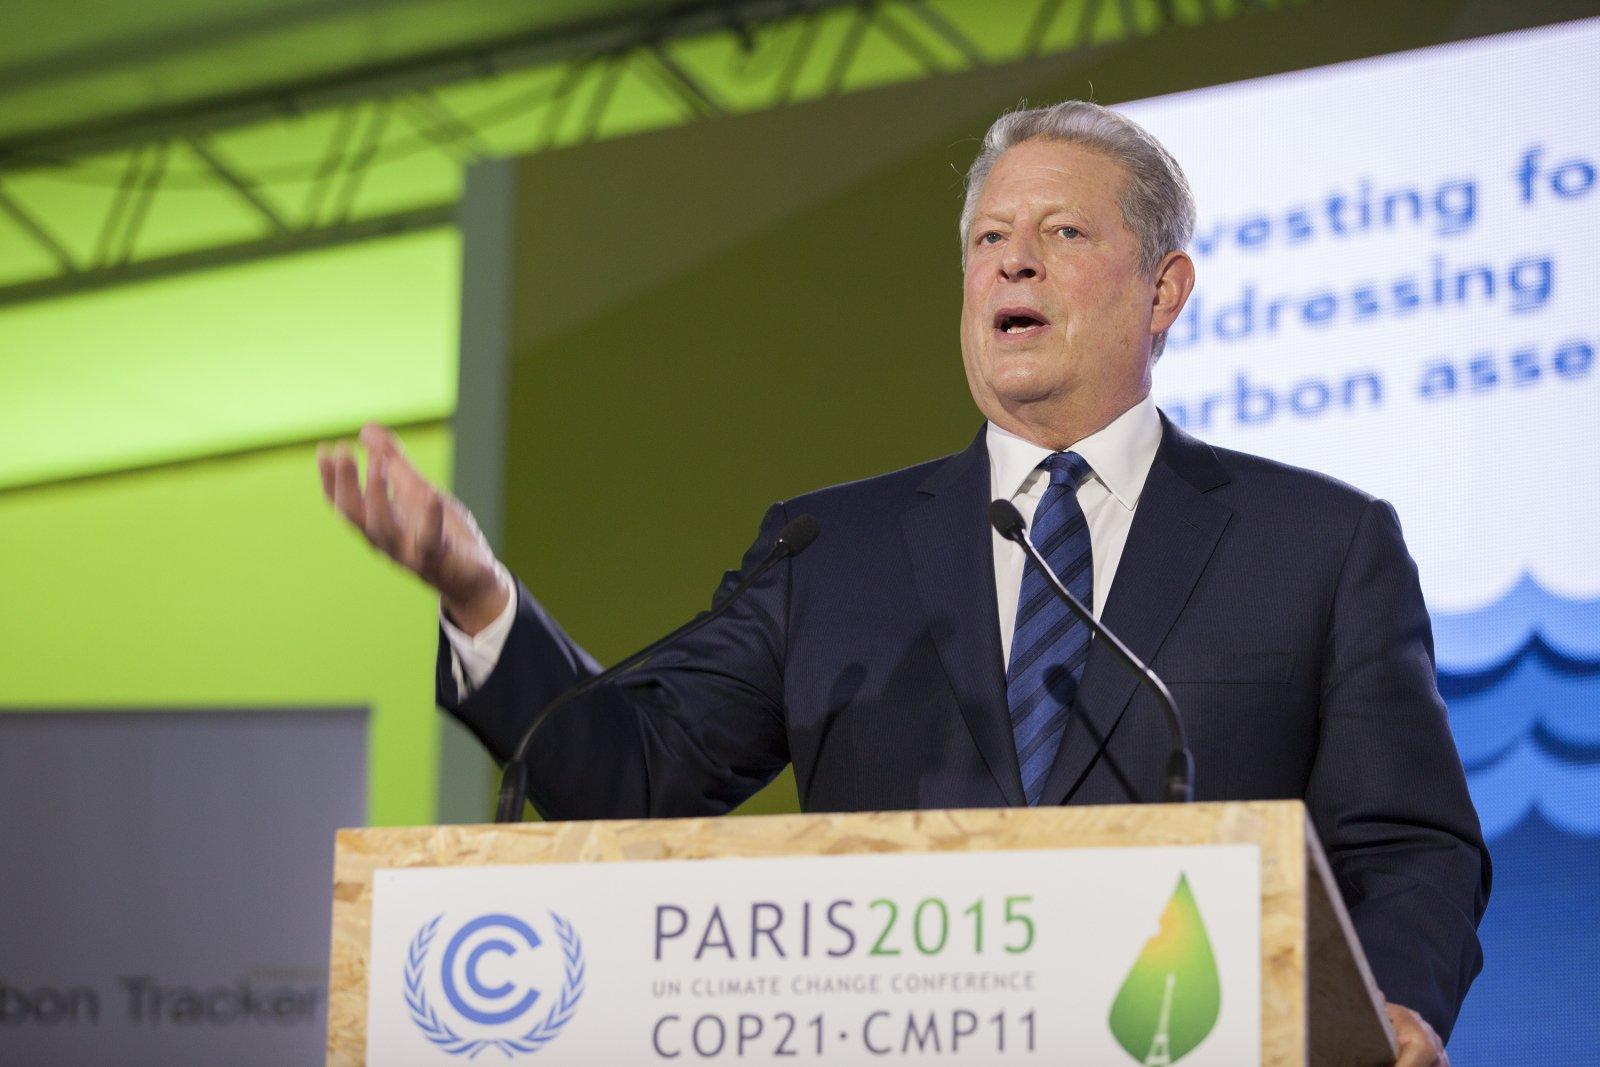 al_gore_cop21_climate_summit_paris_mychaylo_prystupa_mg_6378_w3000.jpg